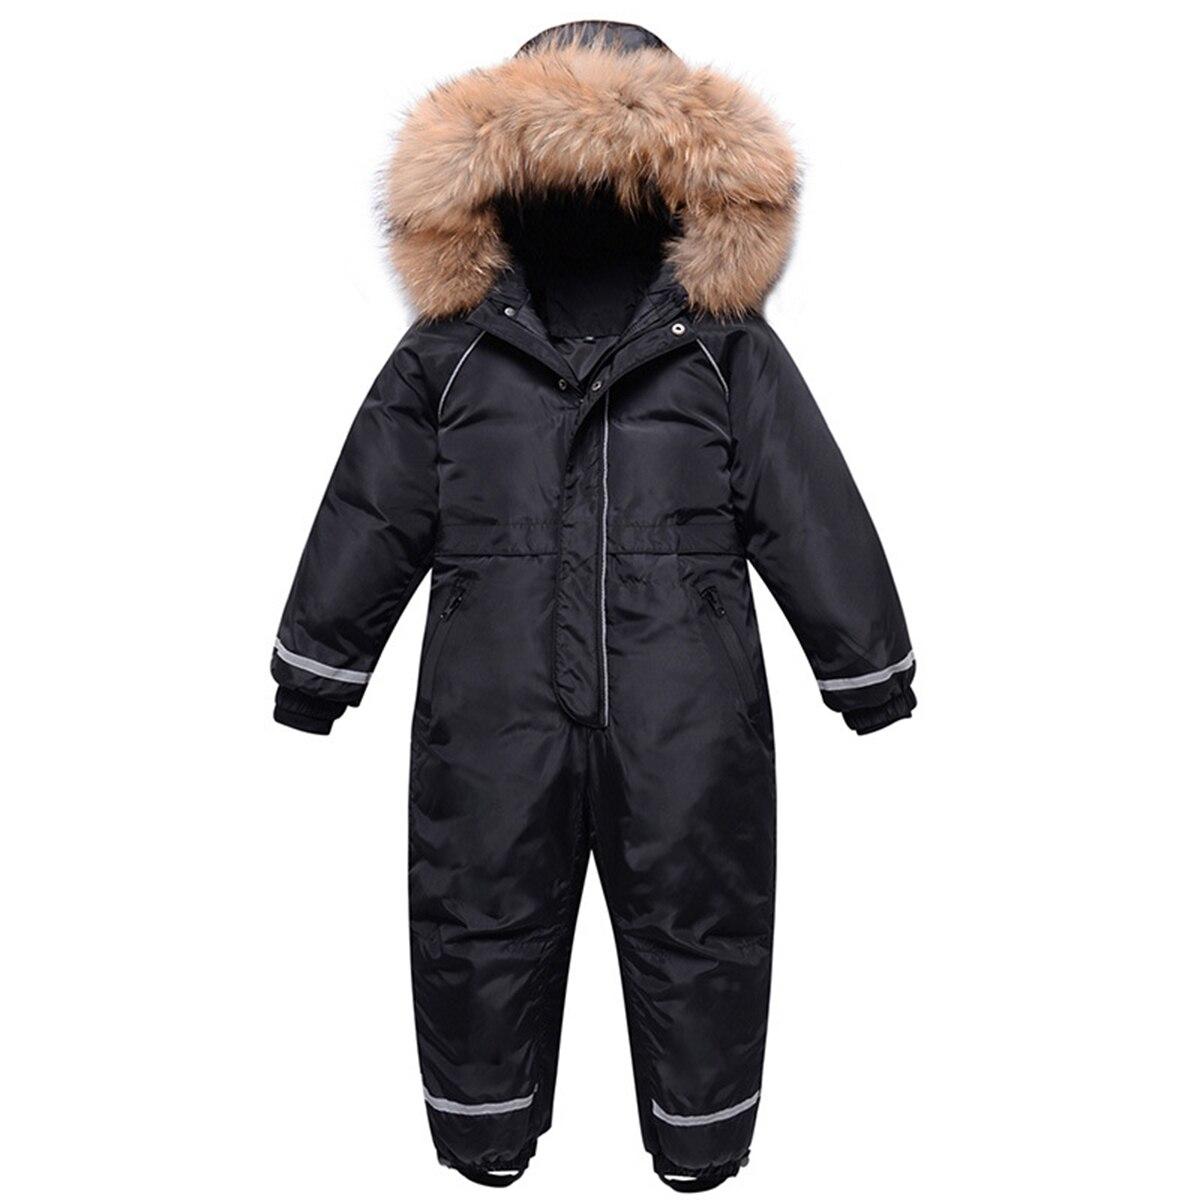 2021 Boys Winter Snowsuit Waterproof Real Fur Thick Girls Jumpsuit Kids Overalls Children Ski Suit Snow Wear enlarge